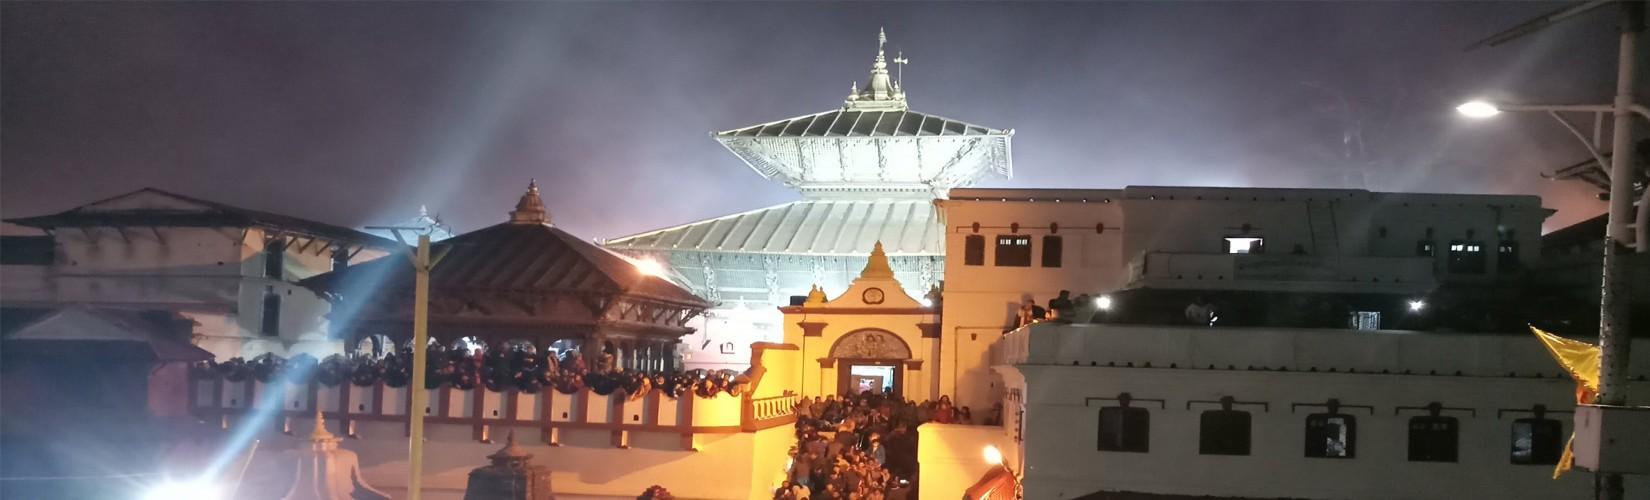 Pashupatinath Lord Shiva Temple in Kathmandu